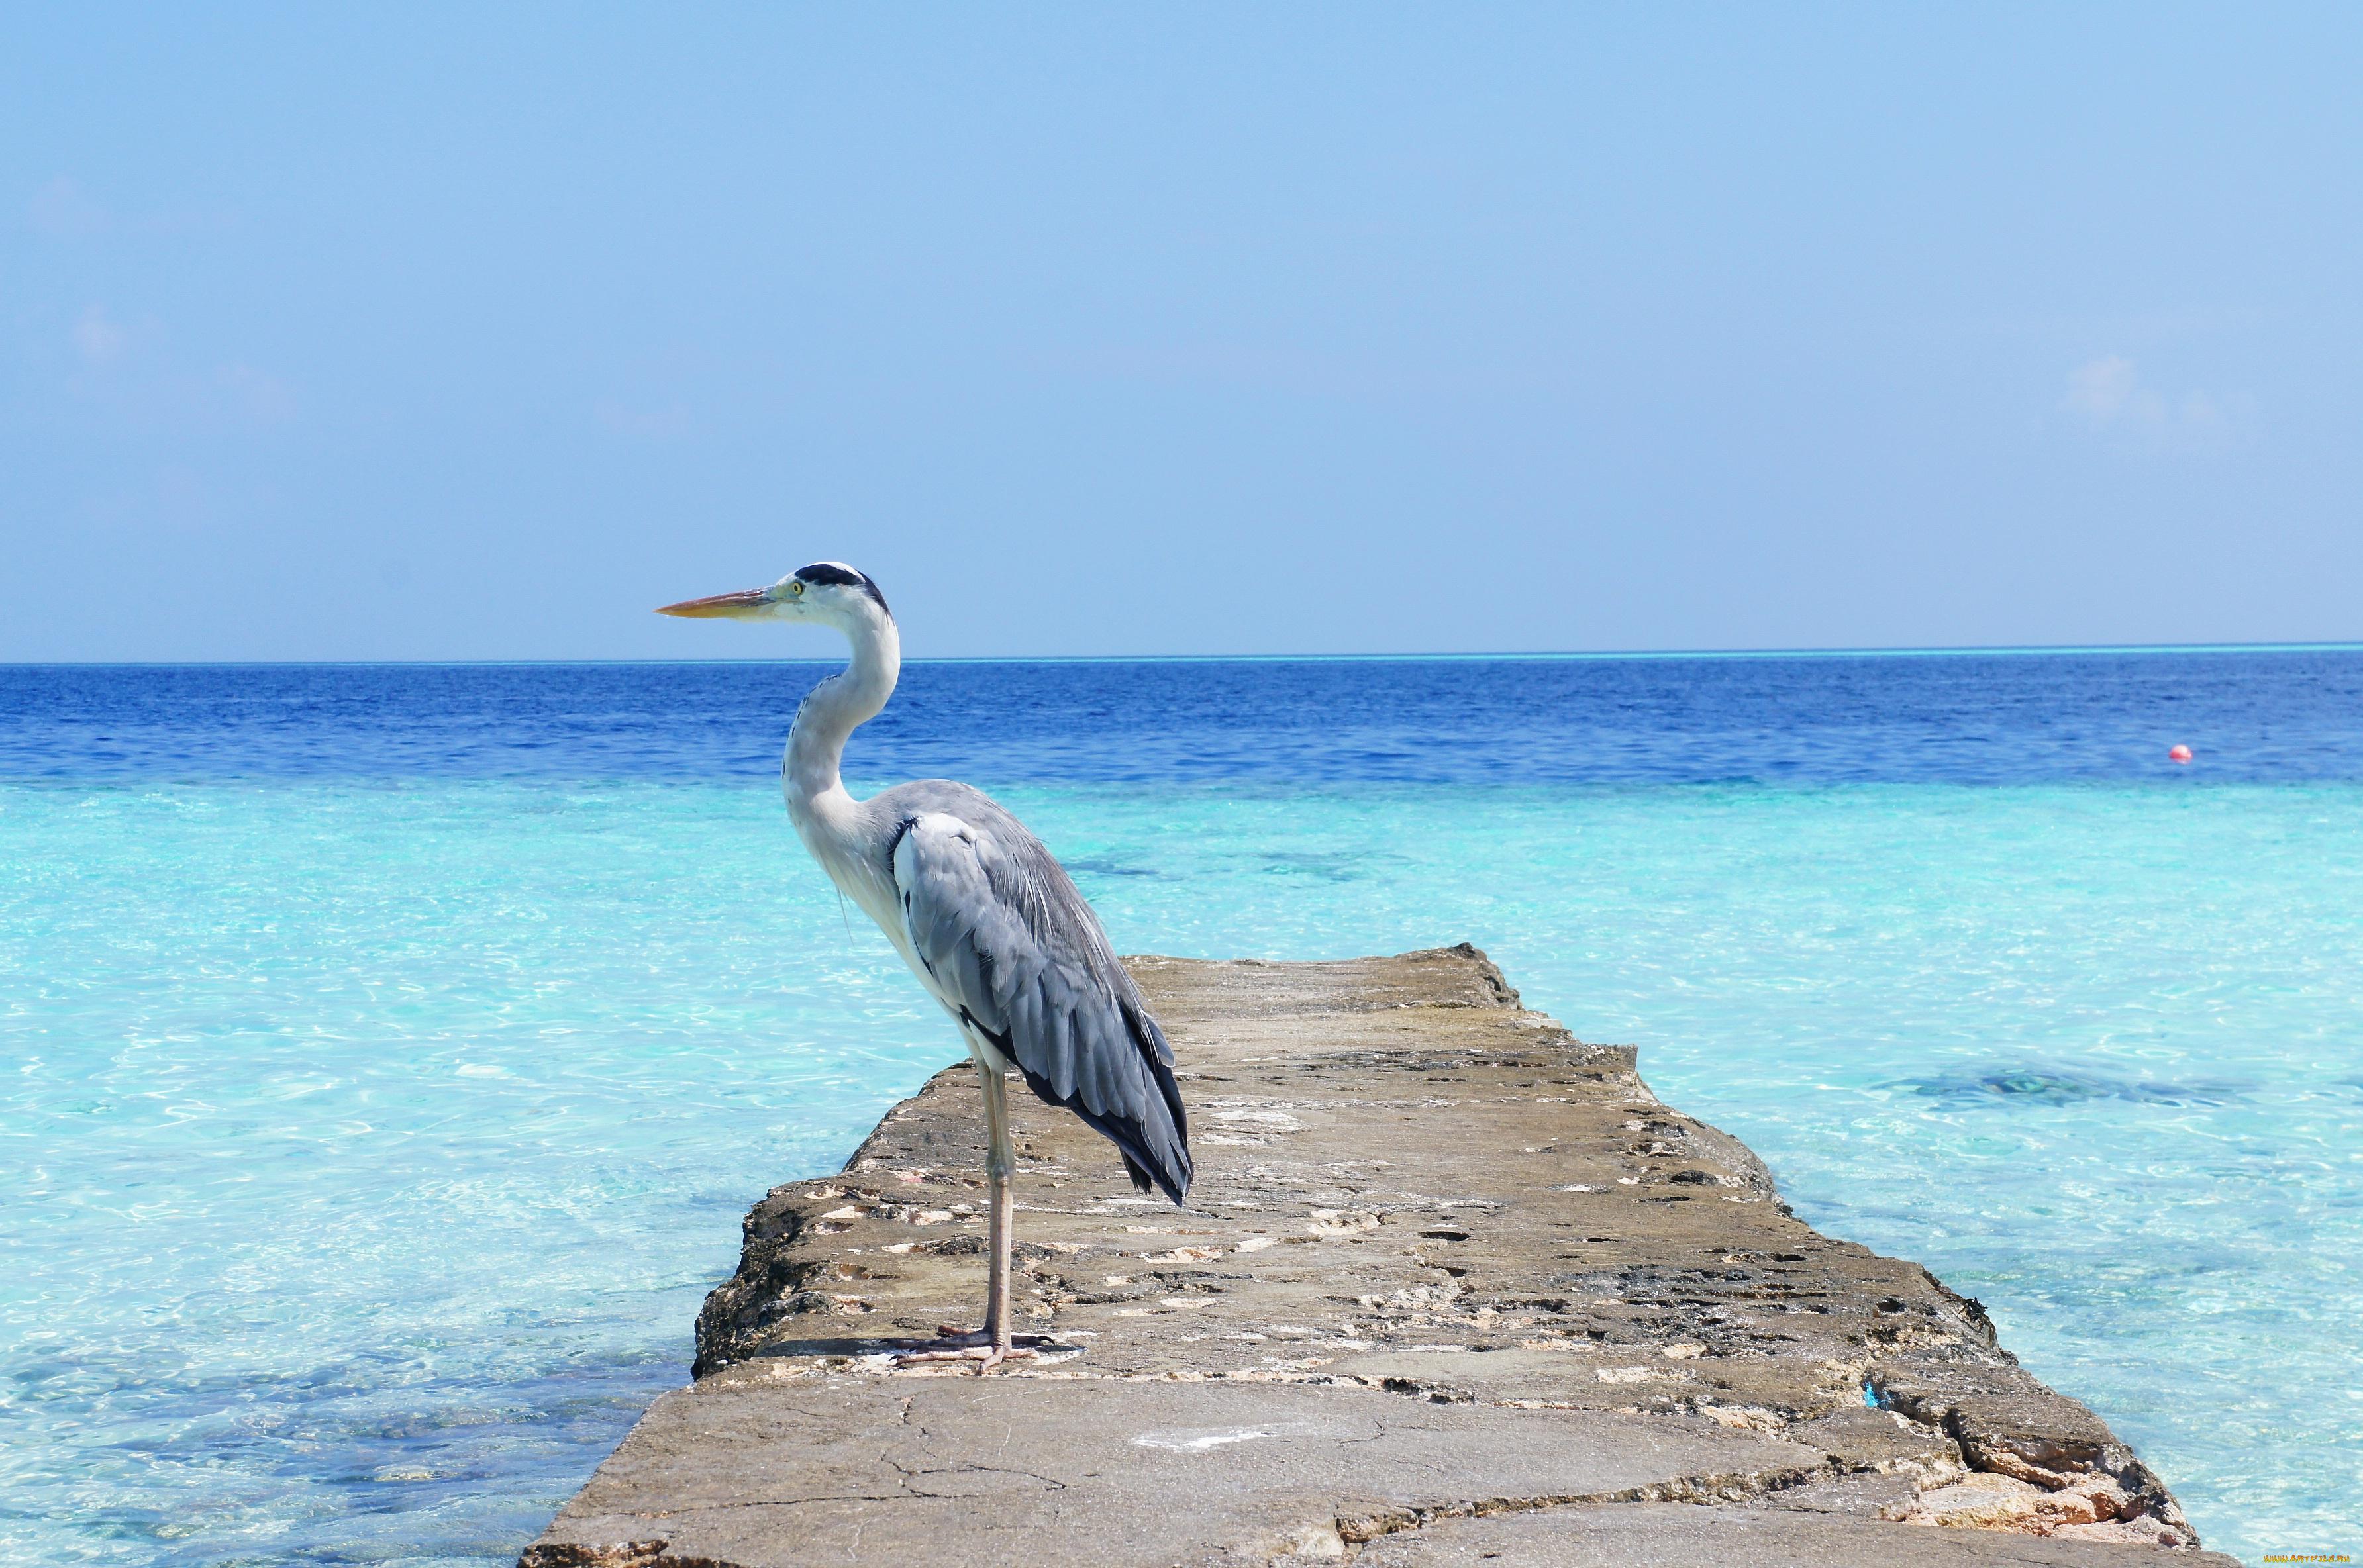 Белая птица на берегу бесплатно